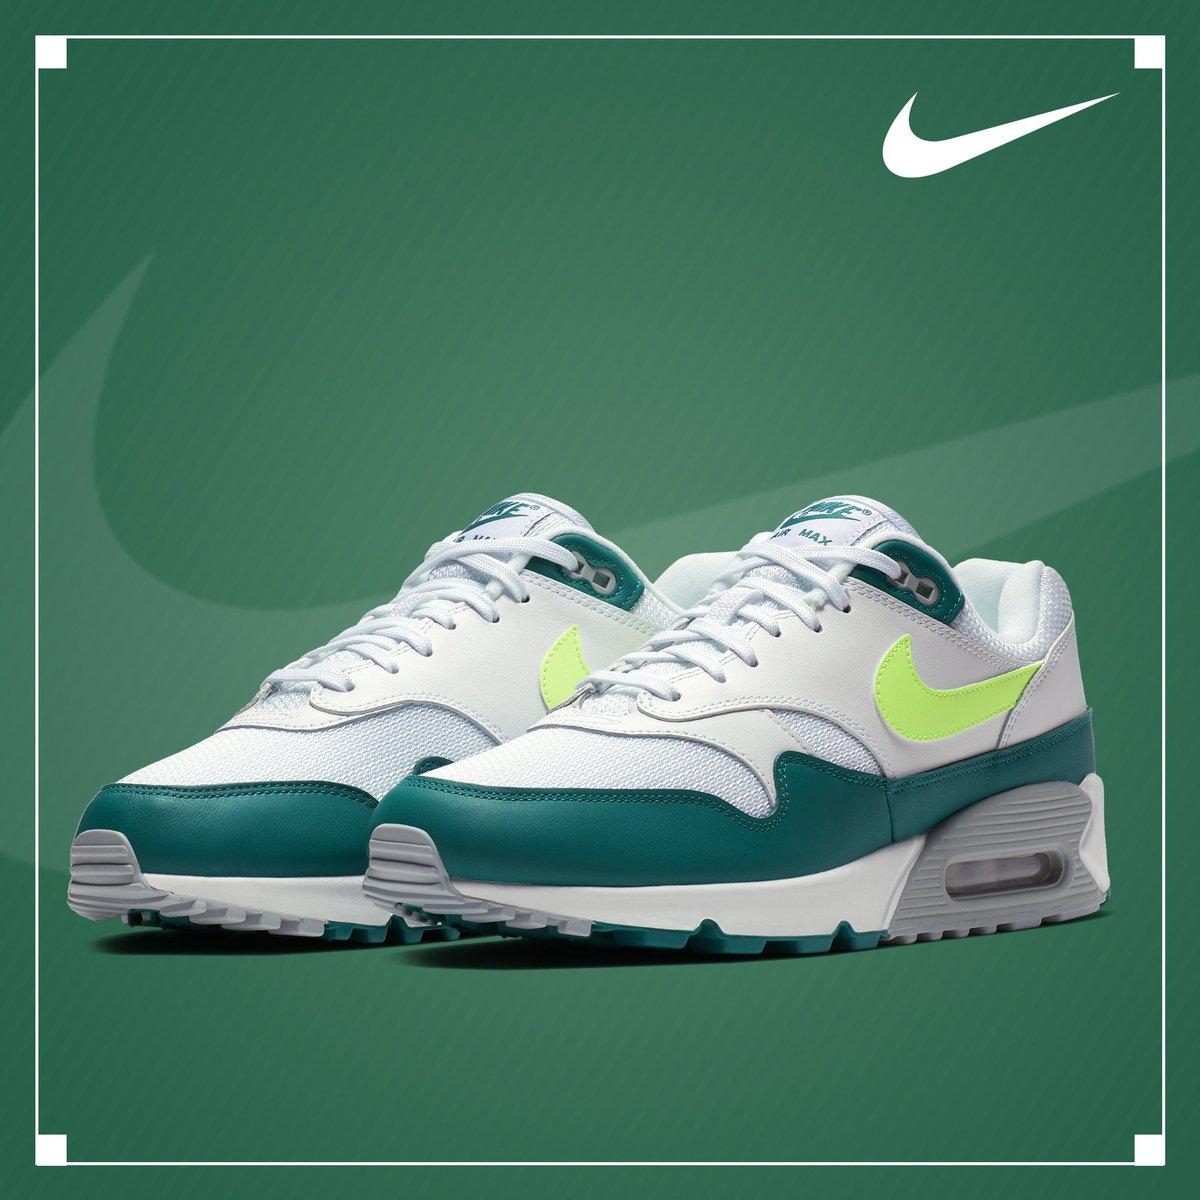 Men's Nike Air Max 901 Spruce Lime AJ7695 103 WhiteLime